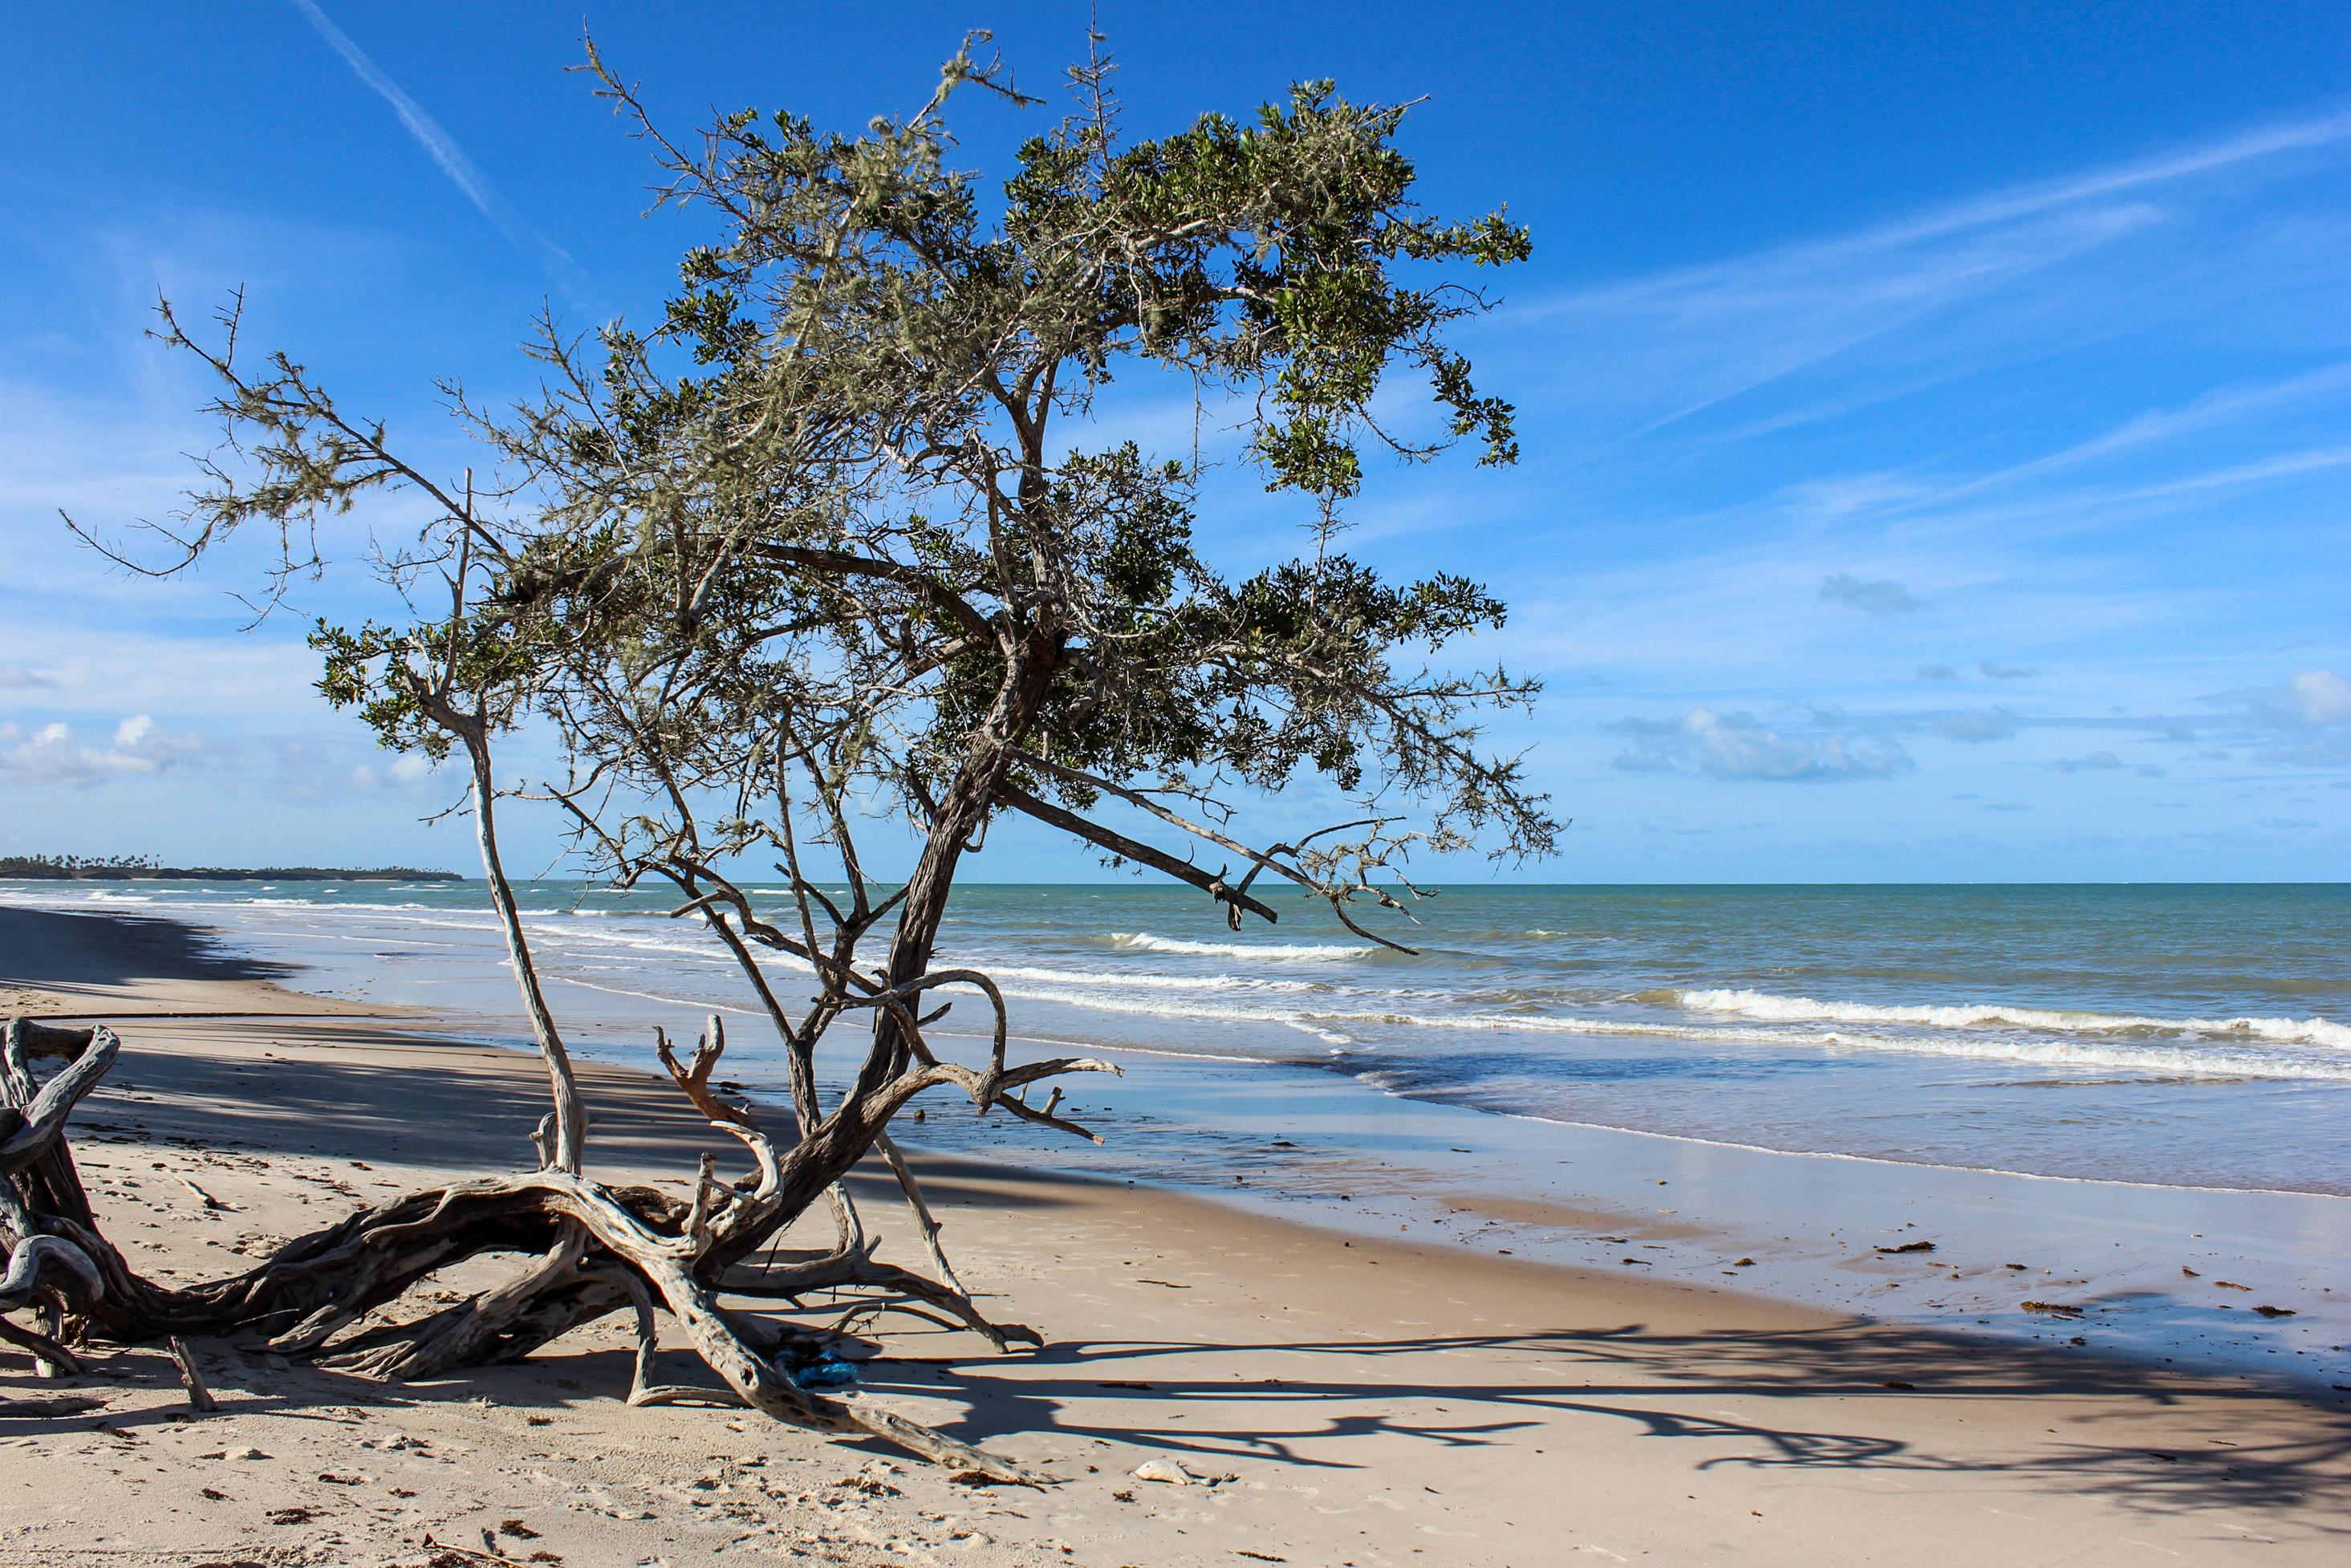 Ba Stock Chart: Árvore retorcida na Praia de Cumuruxatiba Prado - BA.jpg ,Chart